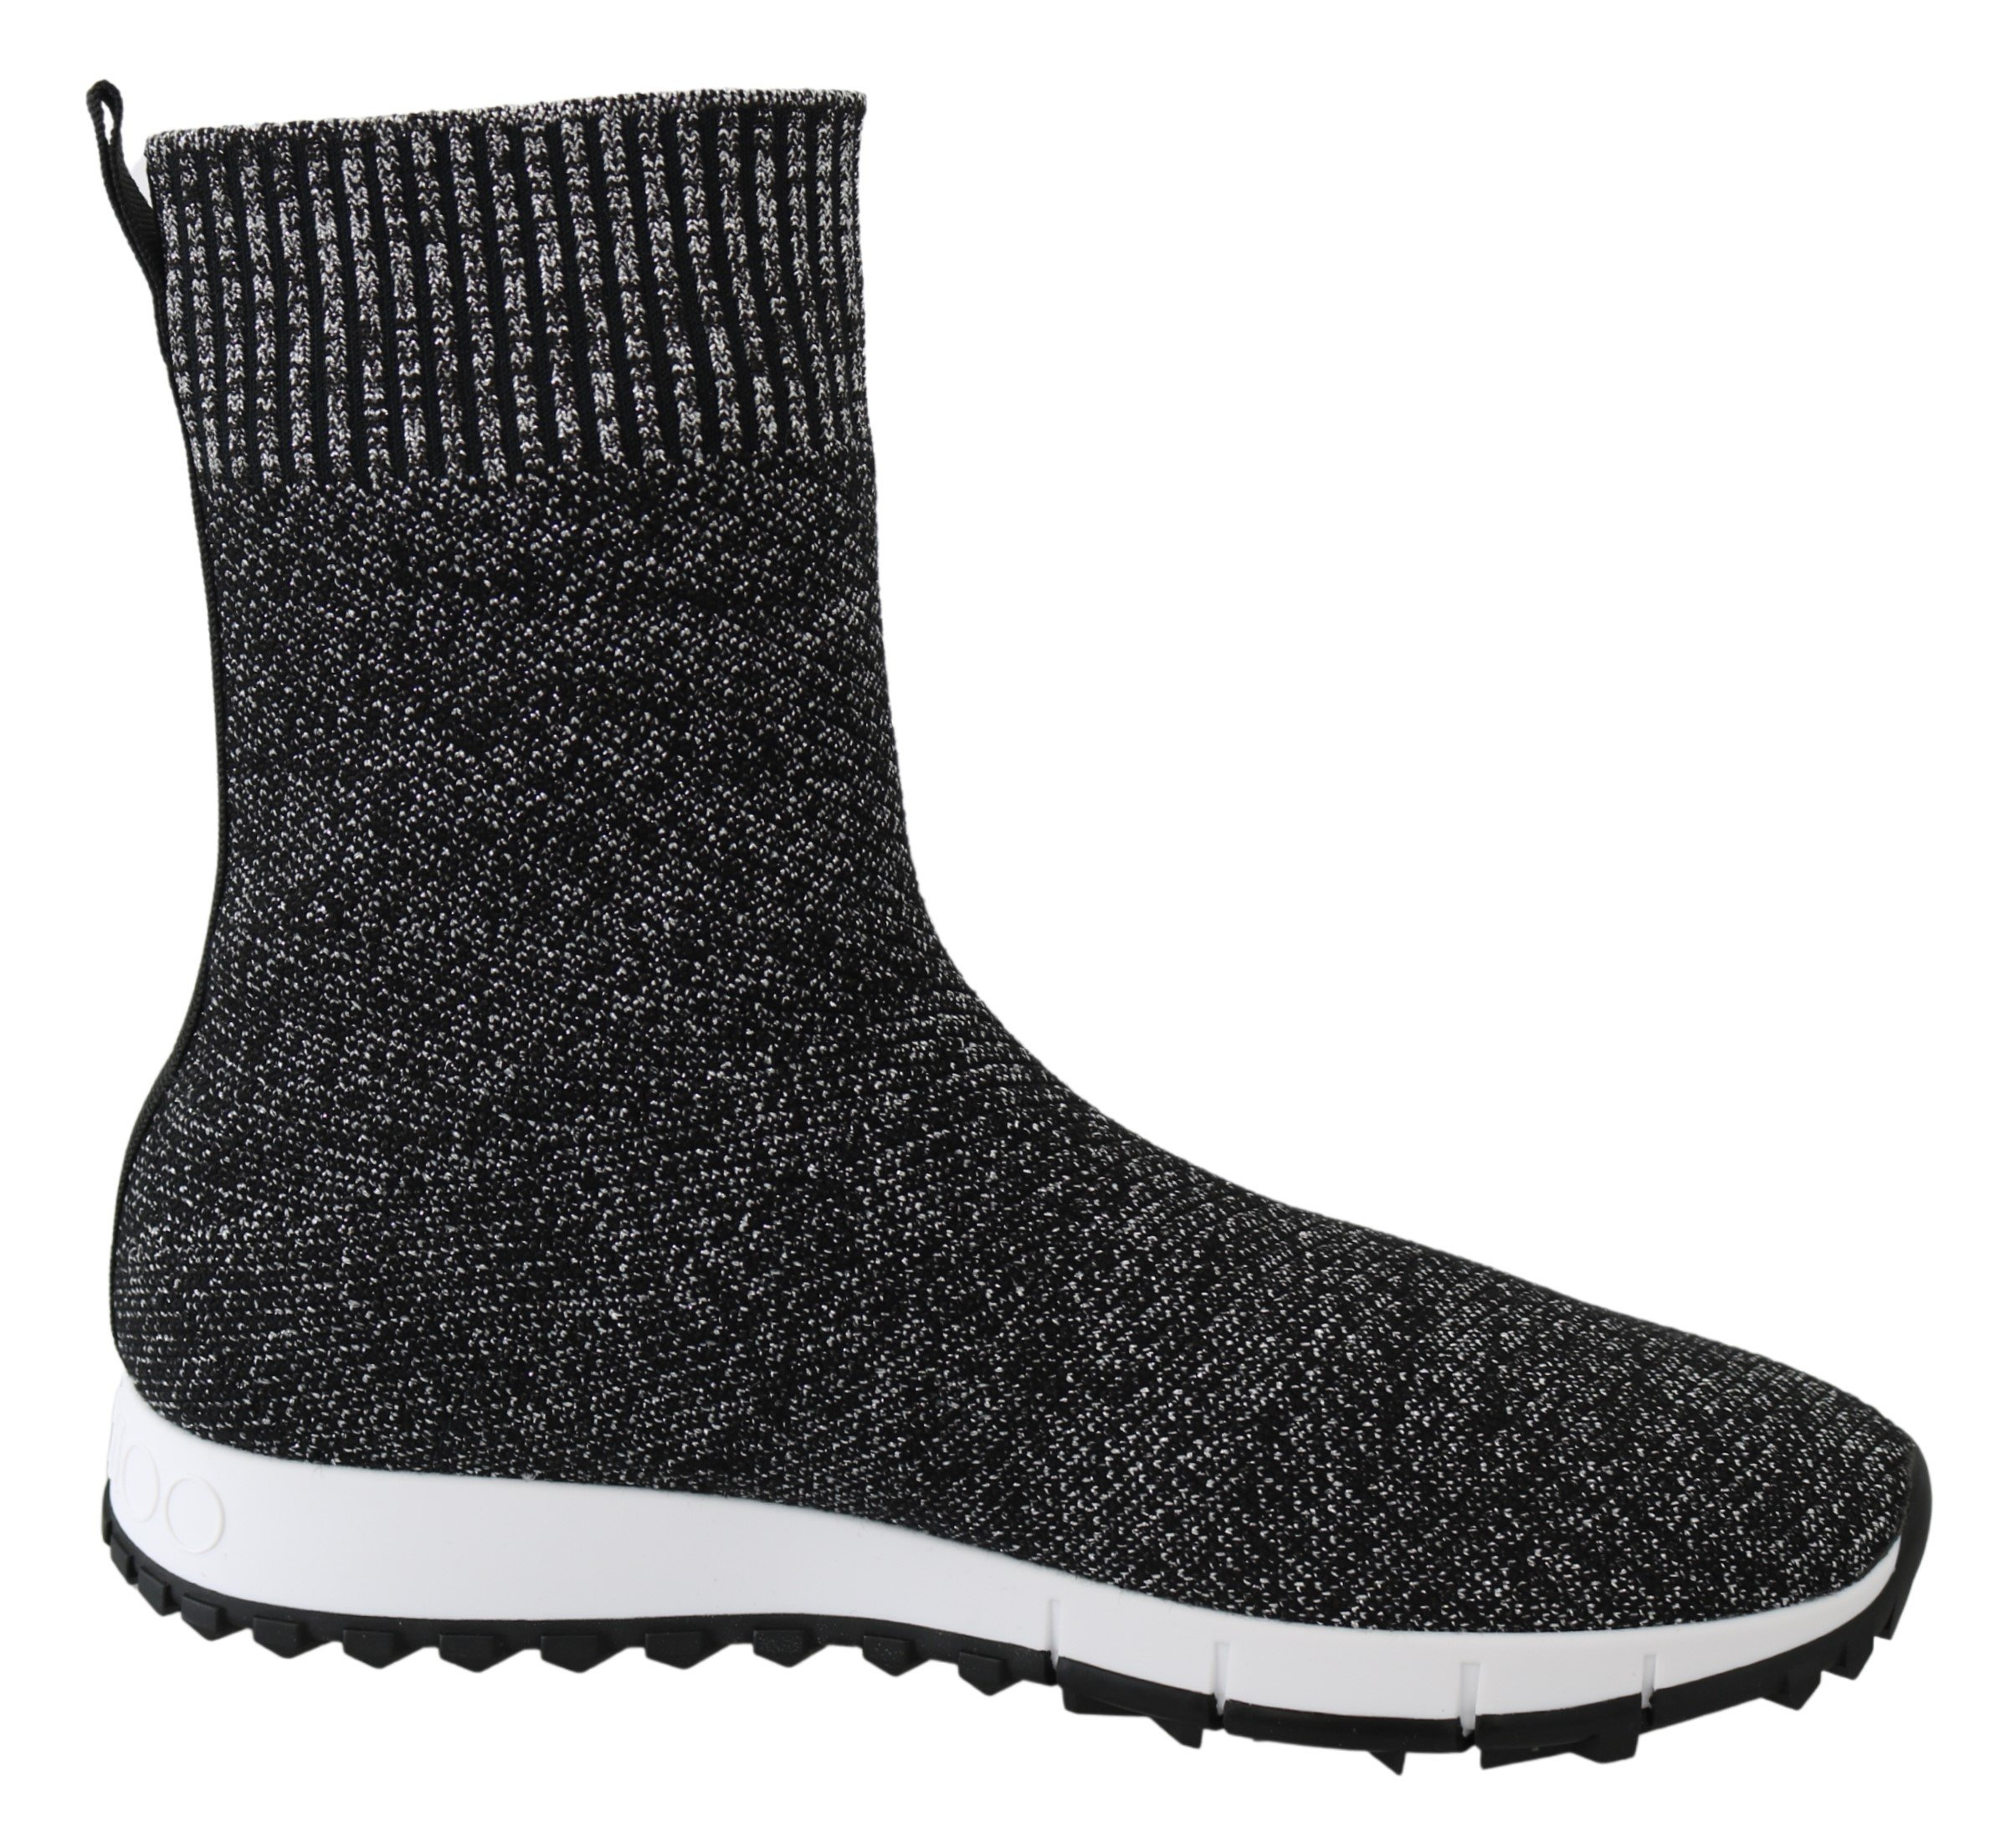 Jimmy Choo Women's Norway Lurex Mix Sneakers Black|Silver 192954712136 - EU37/US7